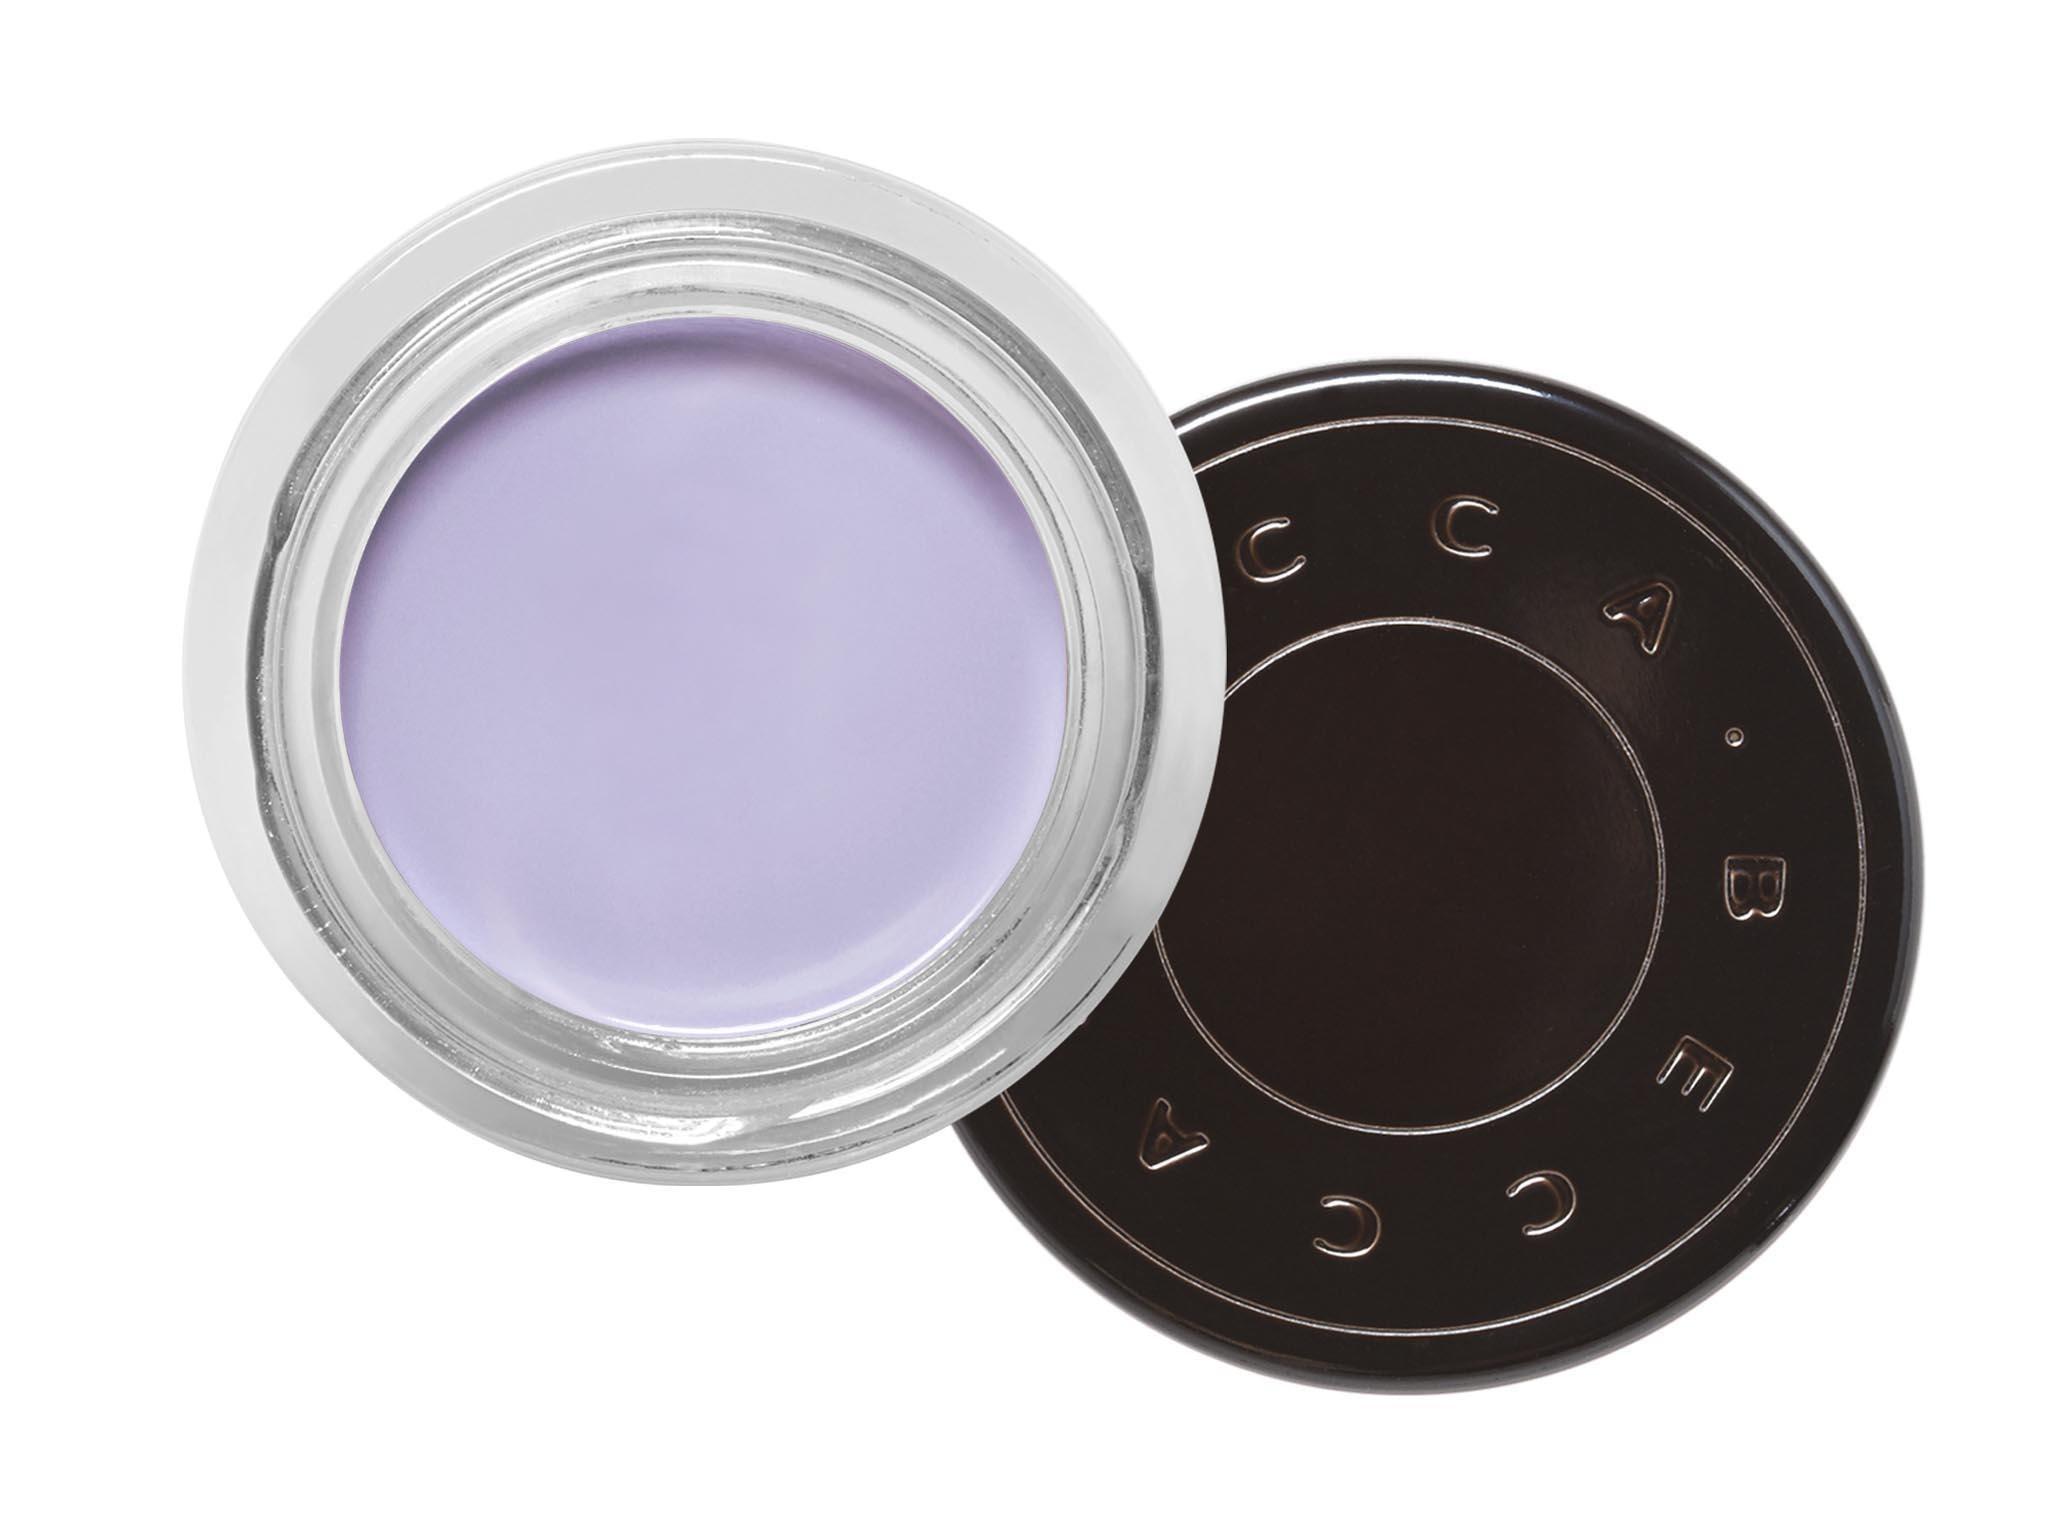 Jbs Mascara Waterproof Hitam Spon Beauty Blender Multi Colour New York Rak Spons Sponge Puff 3 Pcs Becca Backlight Targeted